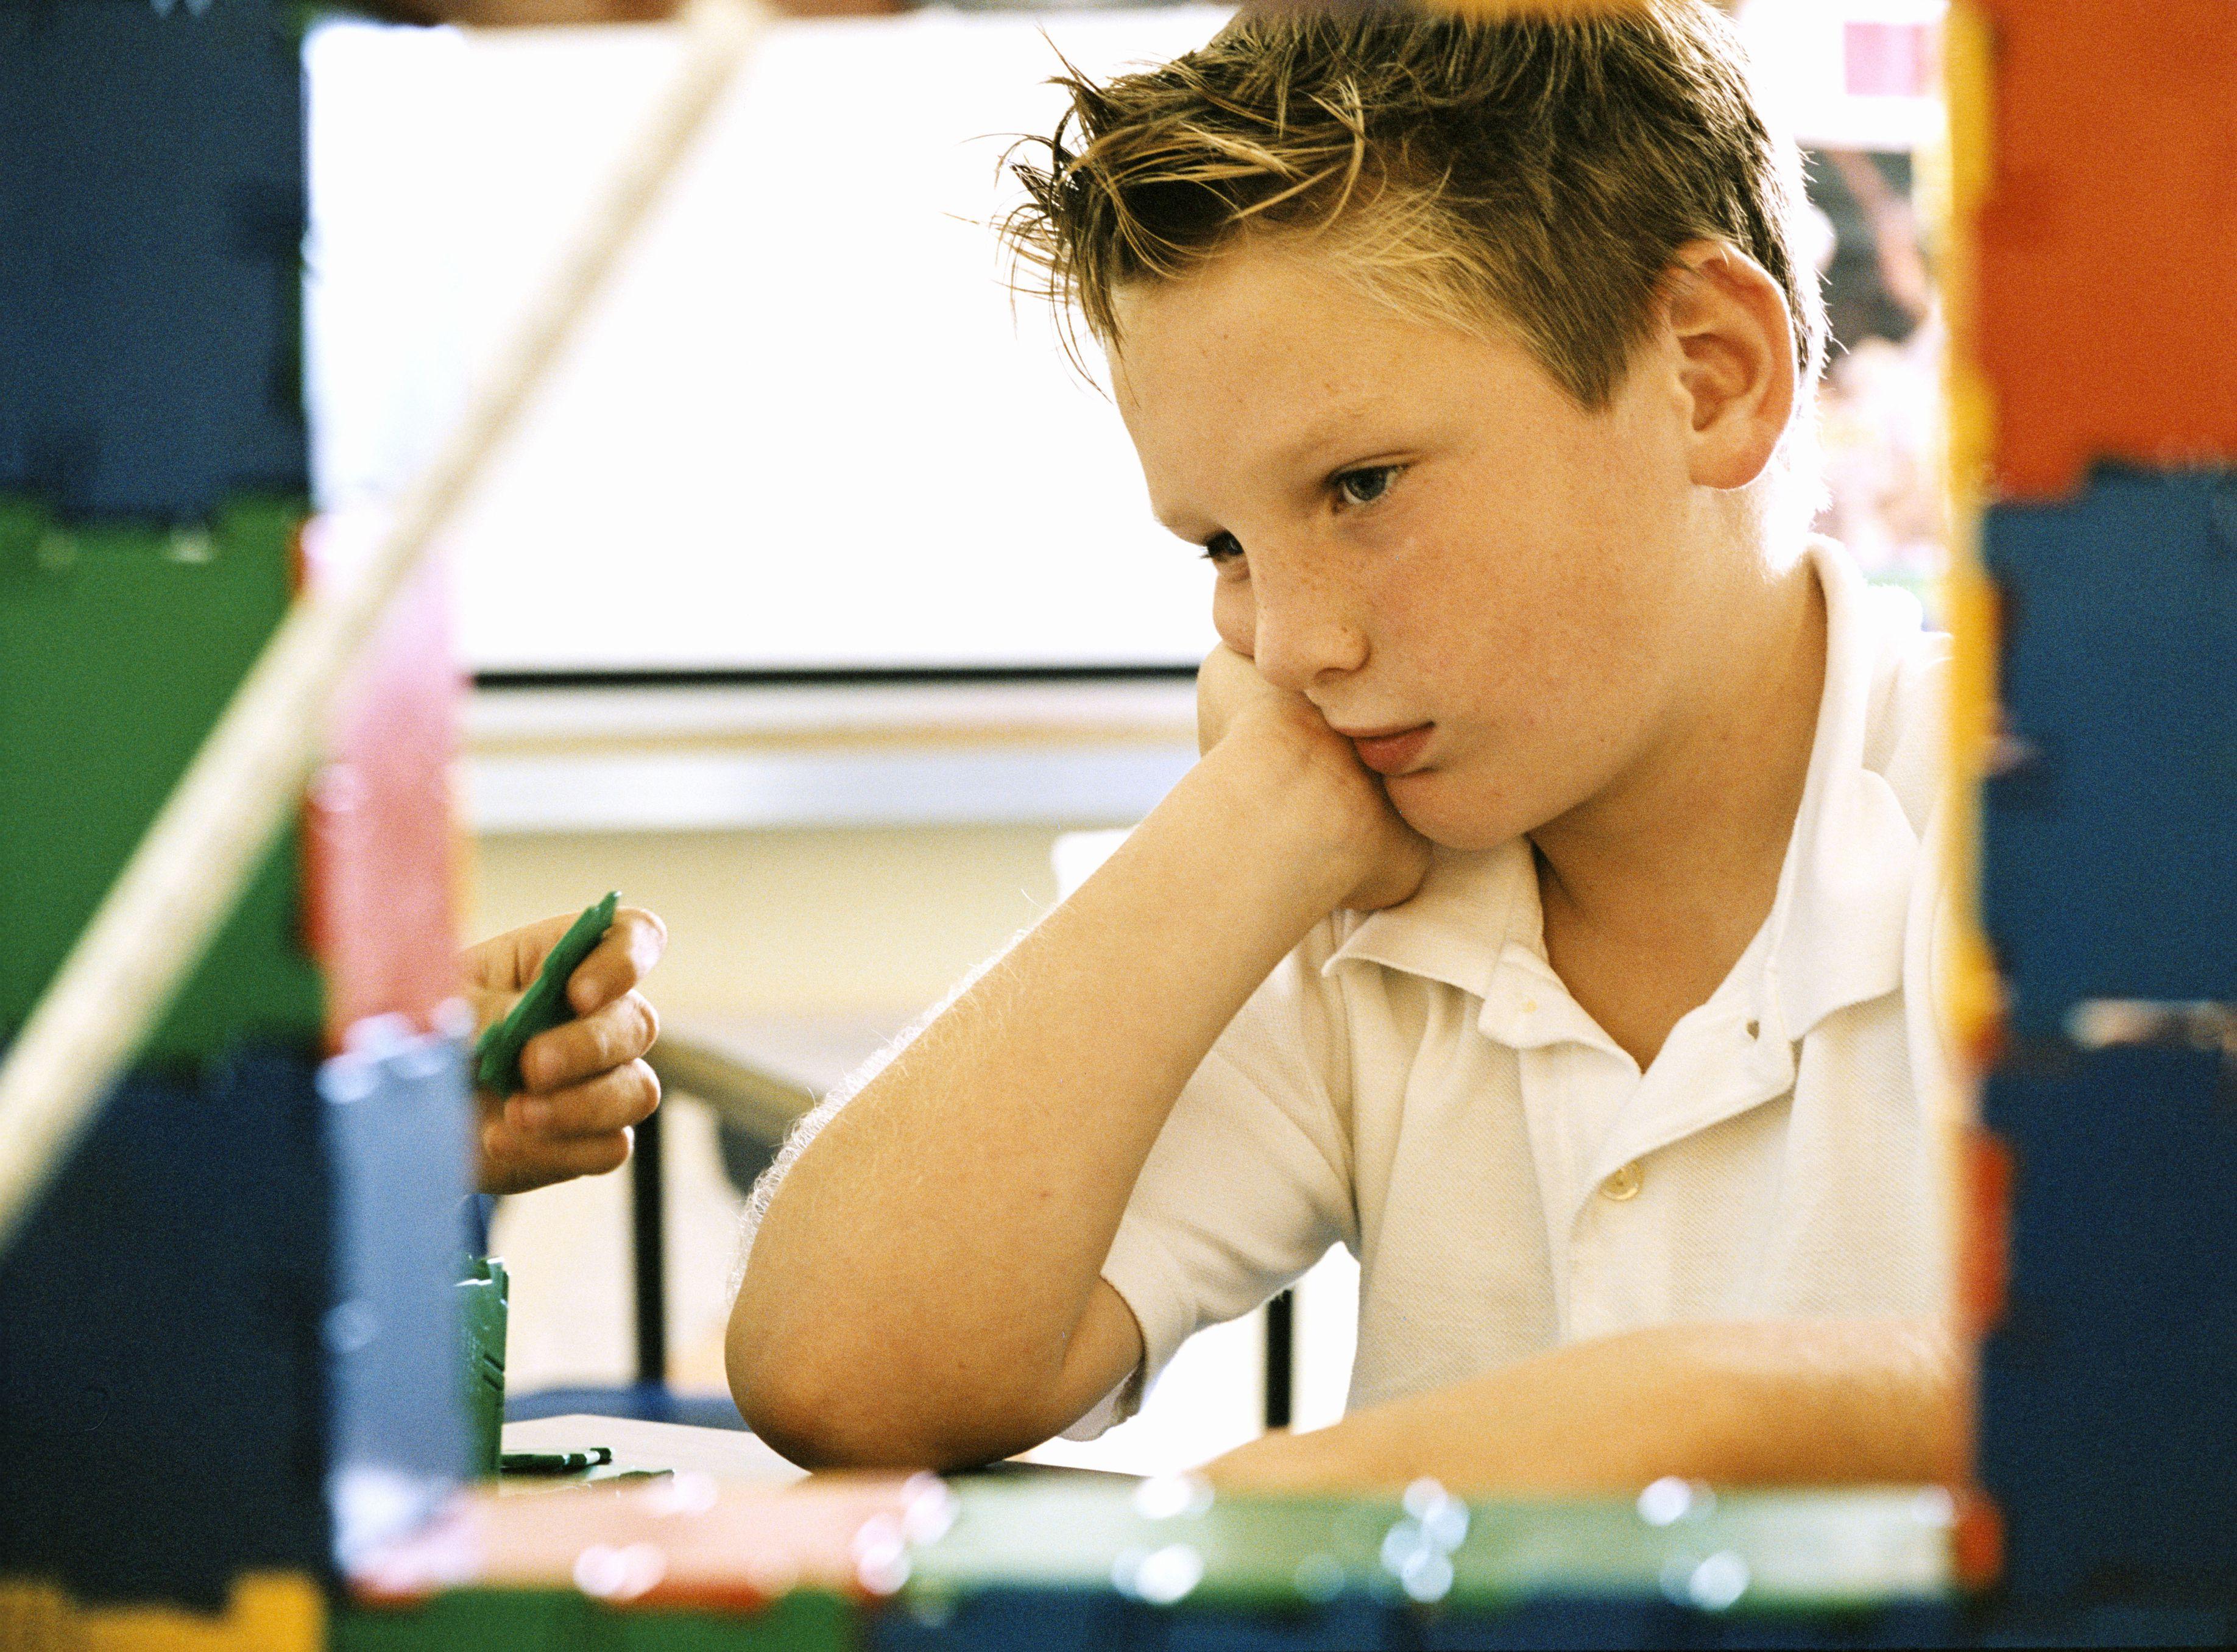 Checklist of ADHD Symptoms